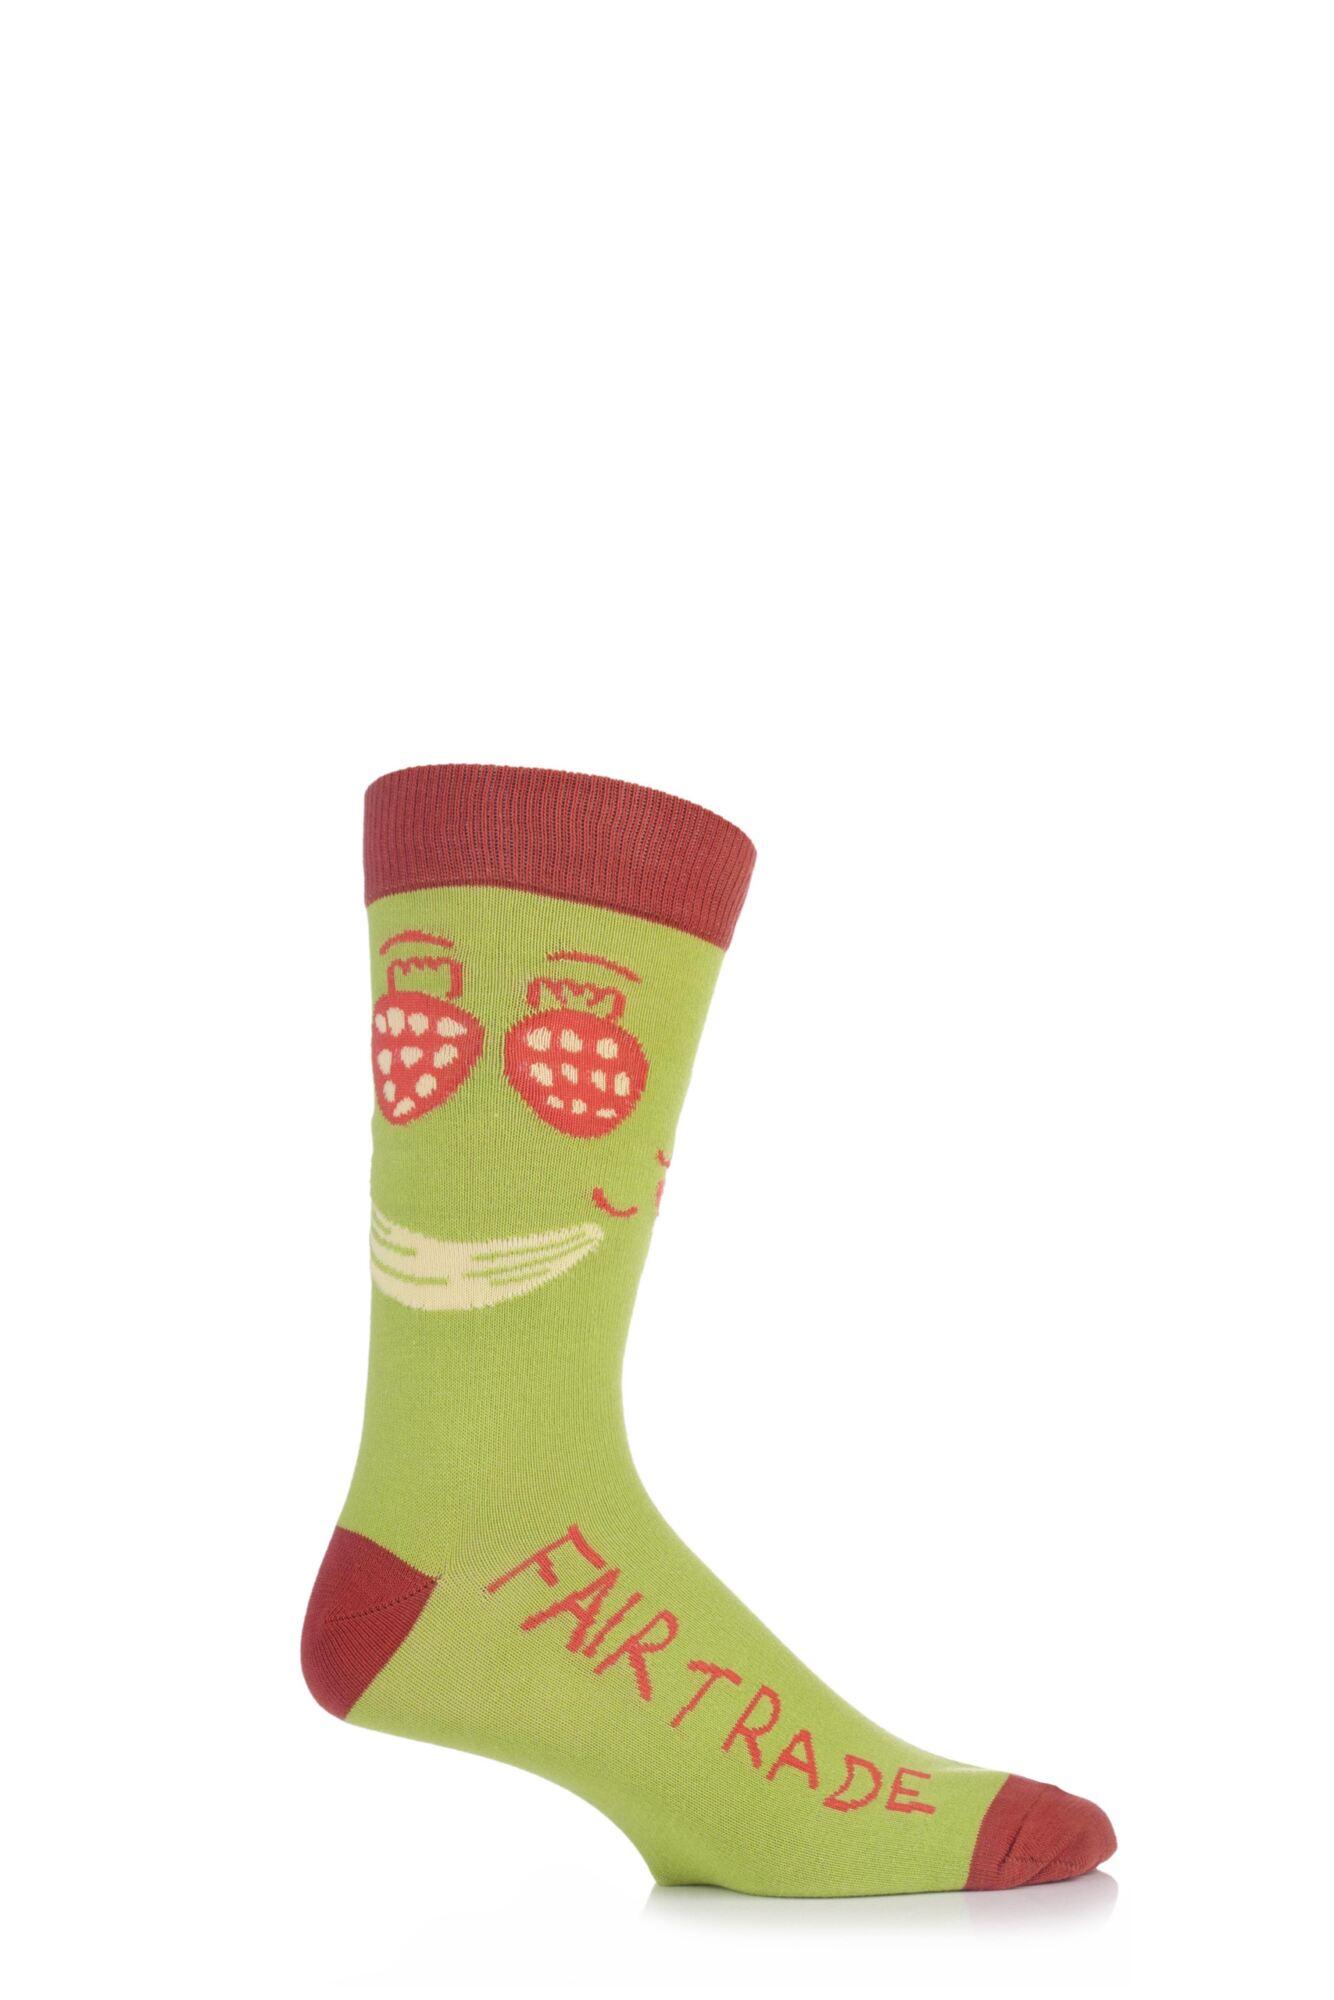 1 Pair CAFOD Fairtrade Cotton Fruit Face Socks Men's - SOCKSHOP